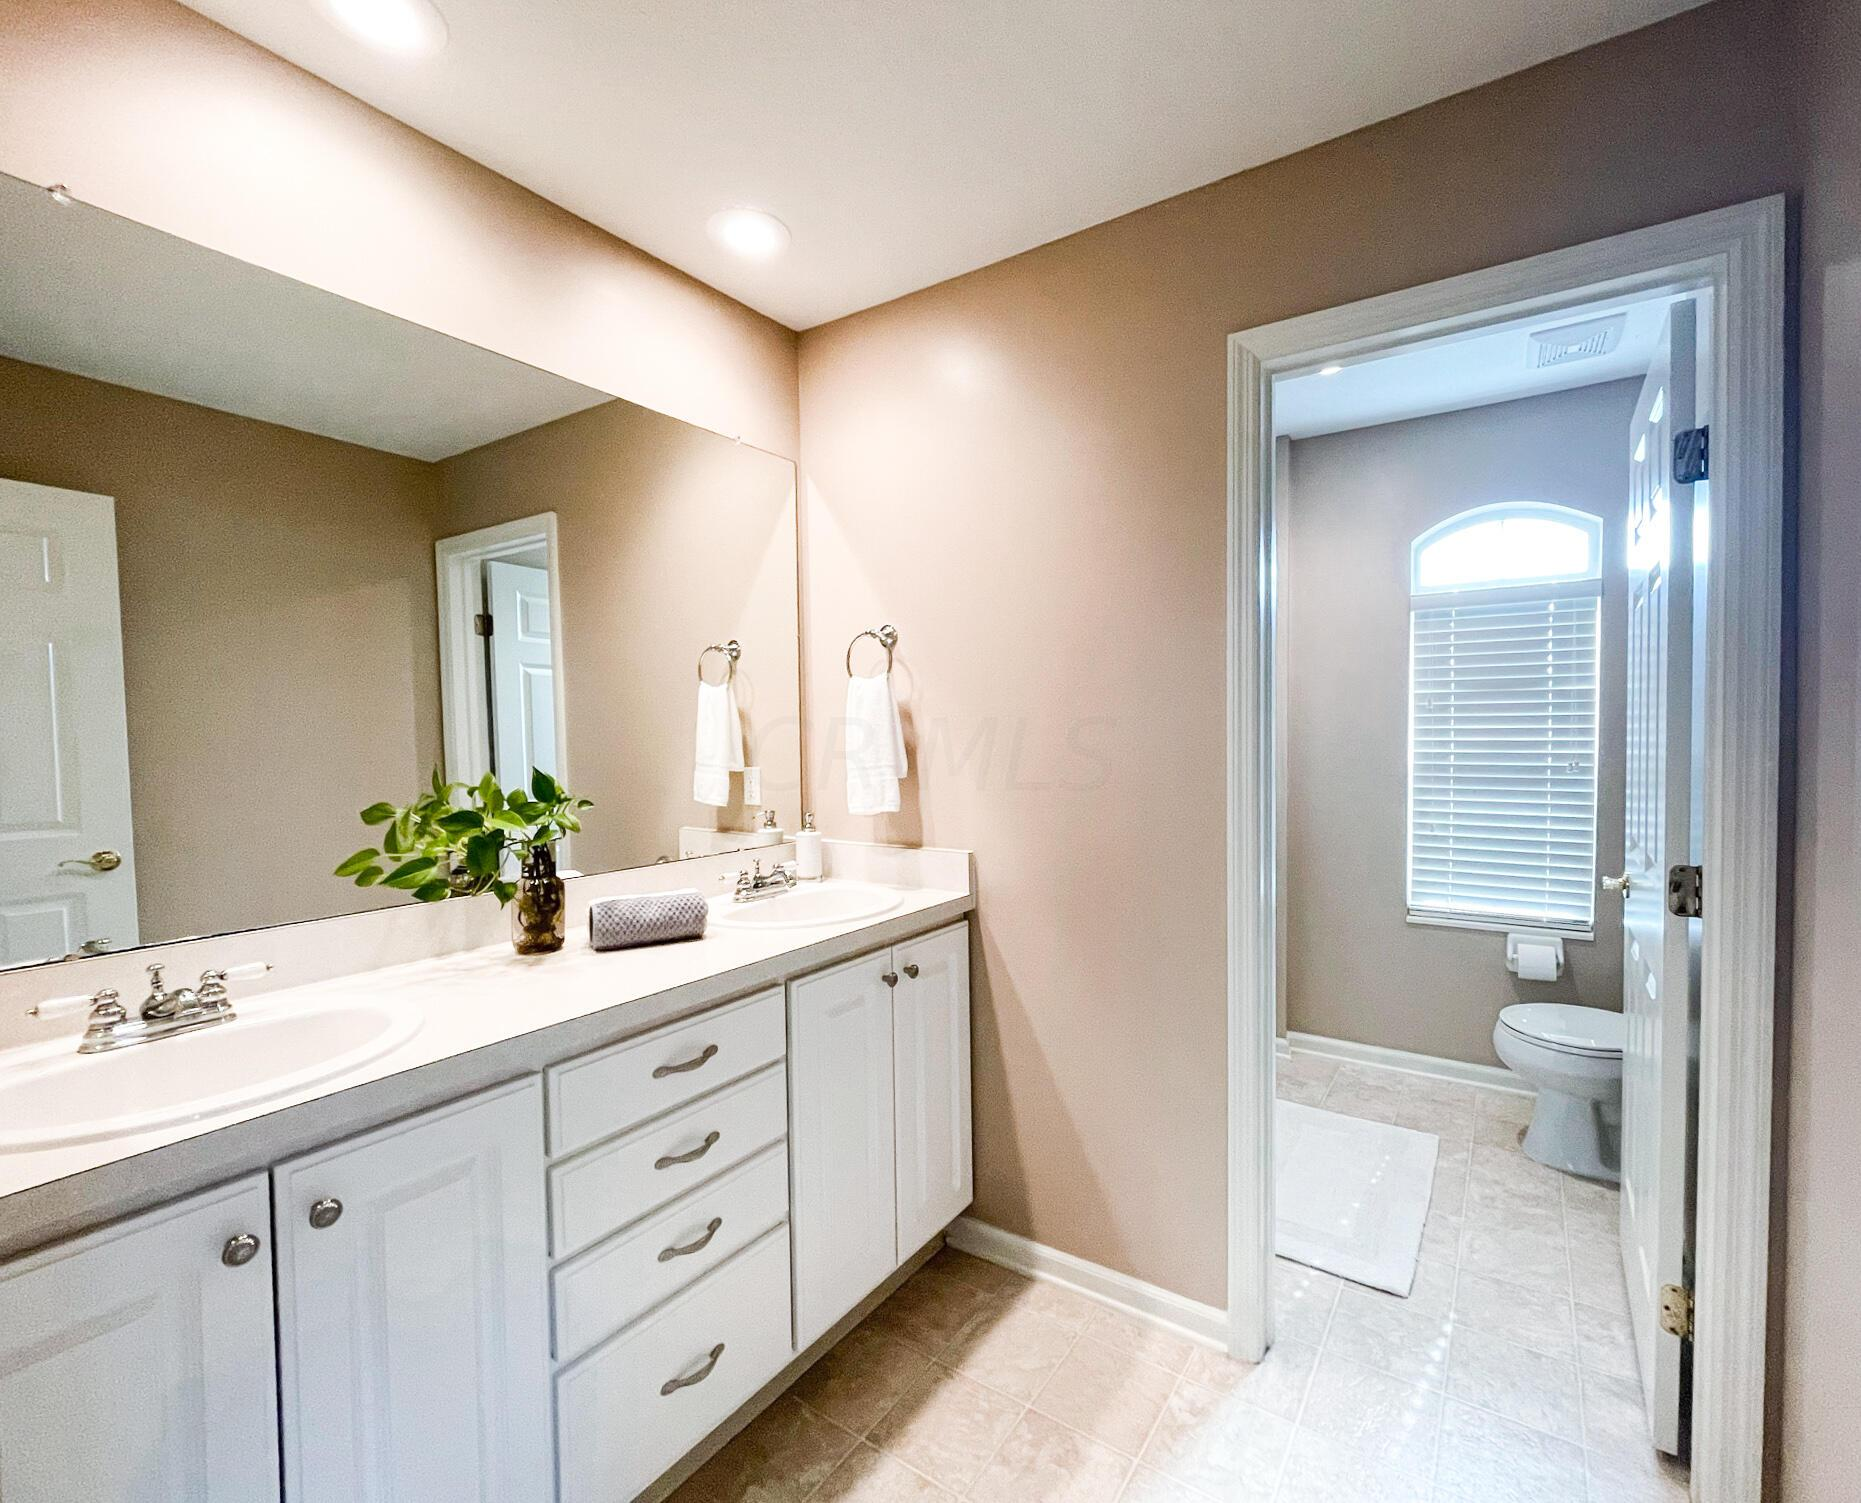 His & Hers Sinks in the En Suite Bath